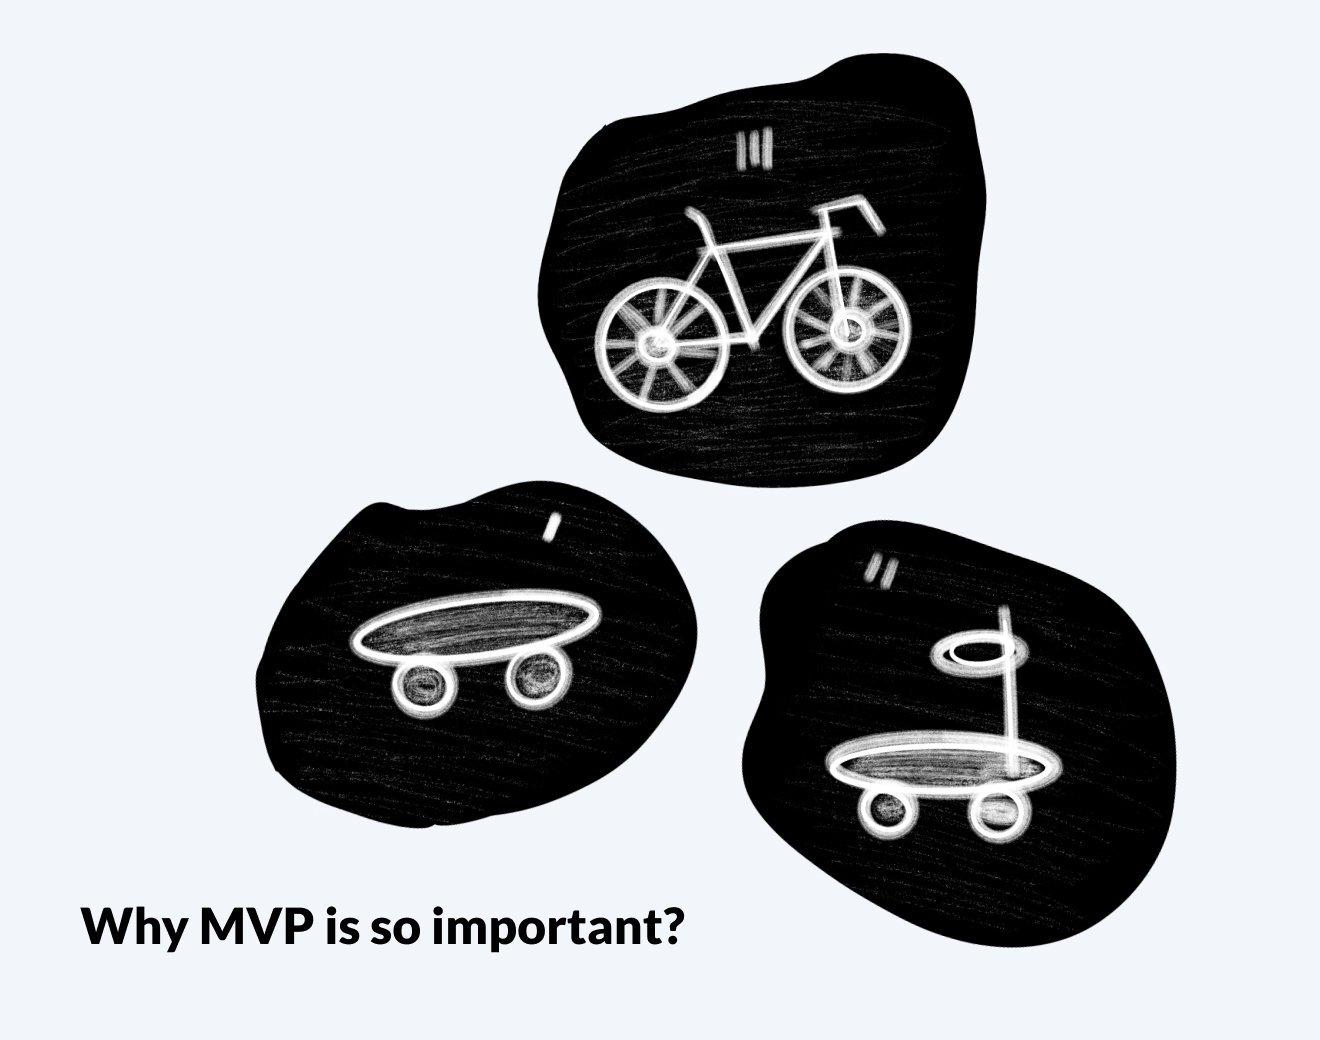 MVP design?